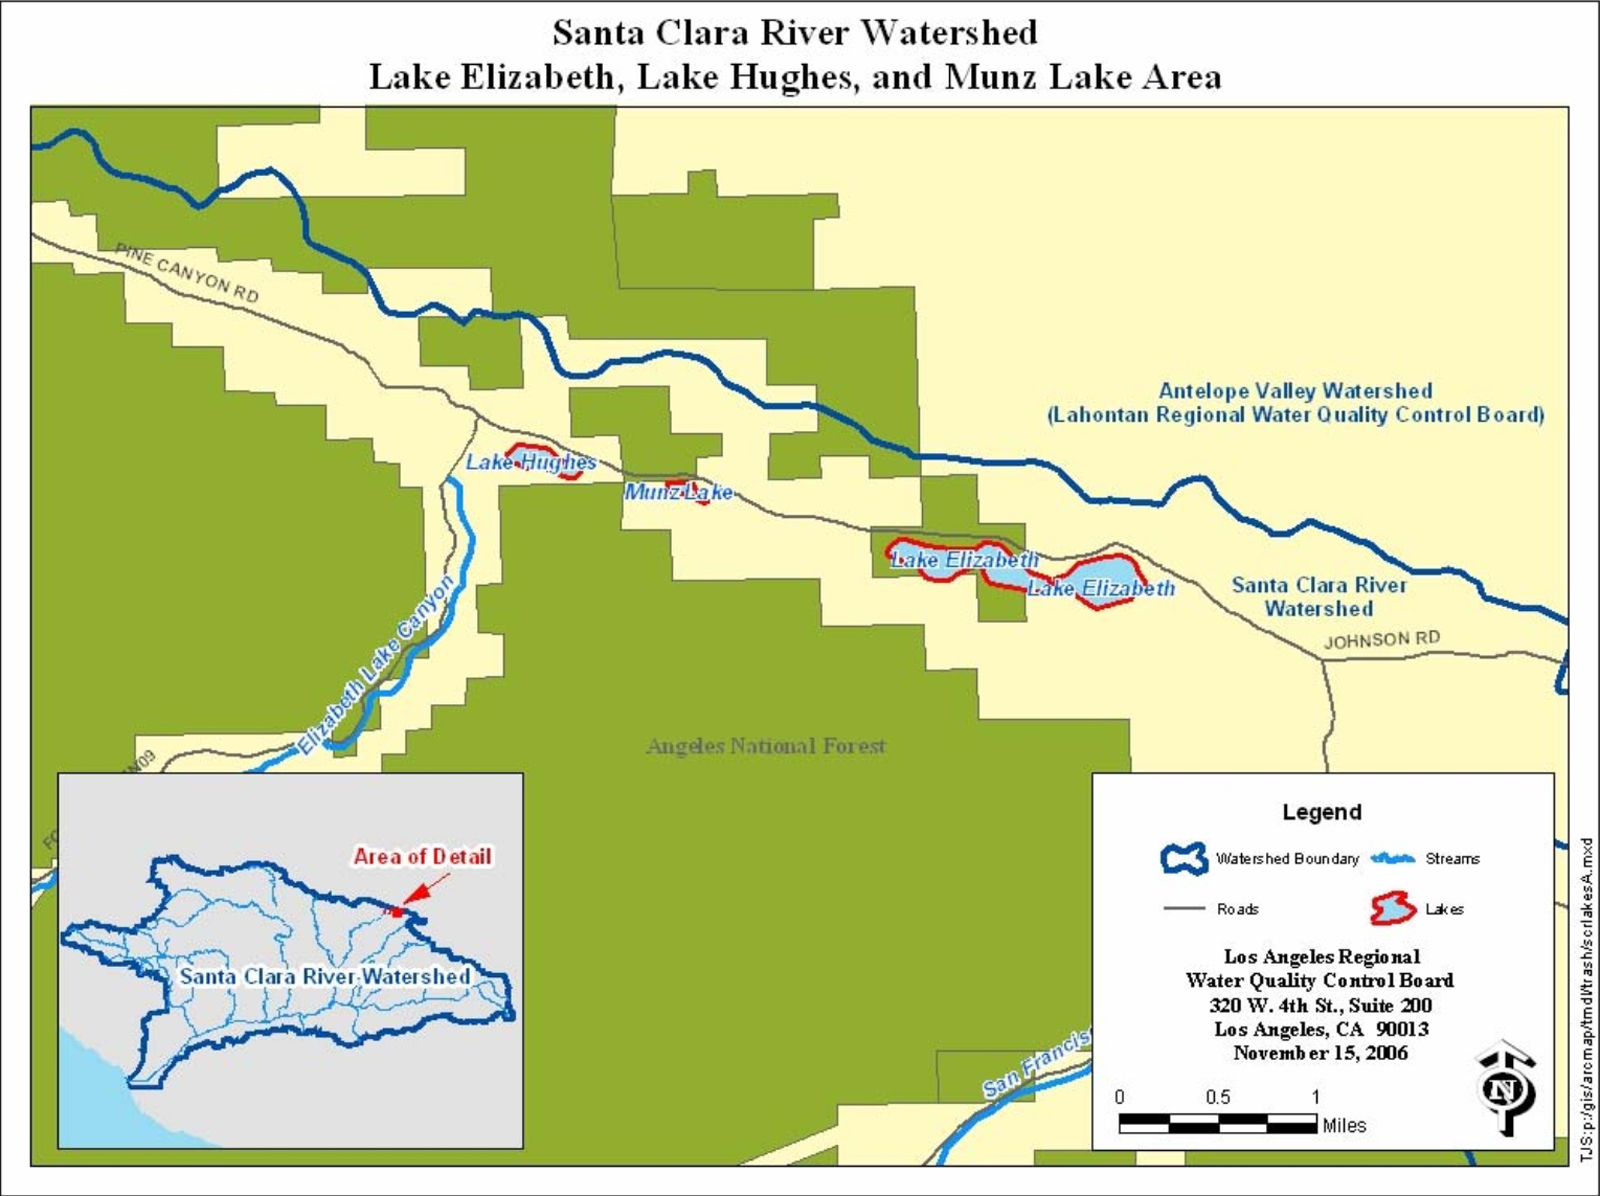 lake elizabeth ca map Scvhistory Com Lake Hughes About Lake Elizabeth Lake Hughes lake elizabeth ca map